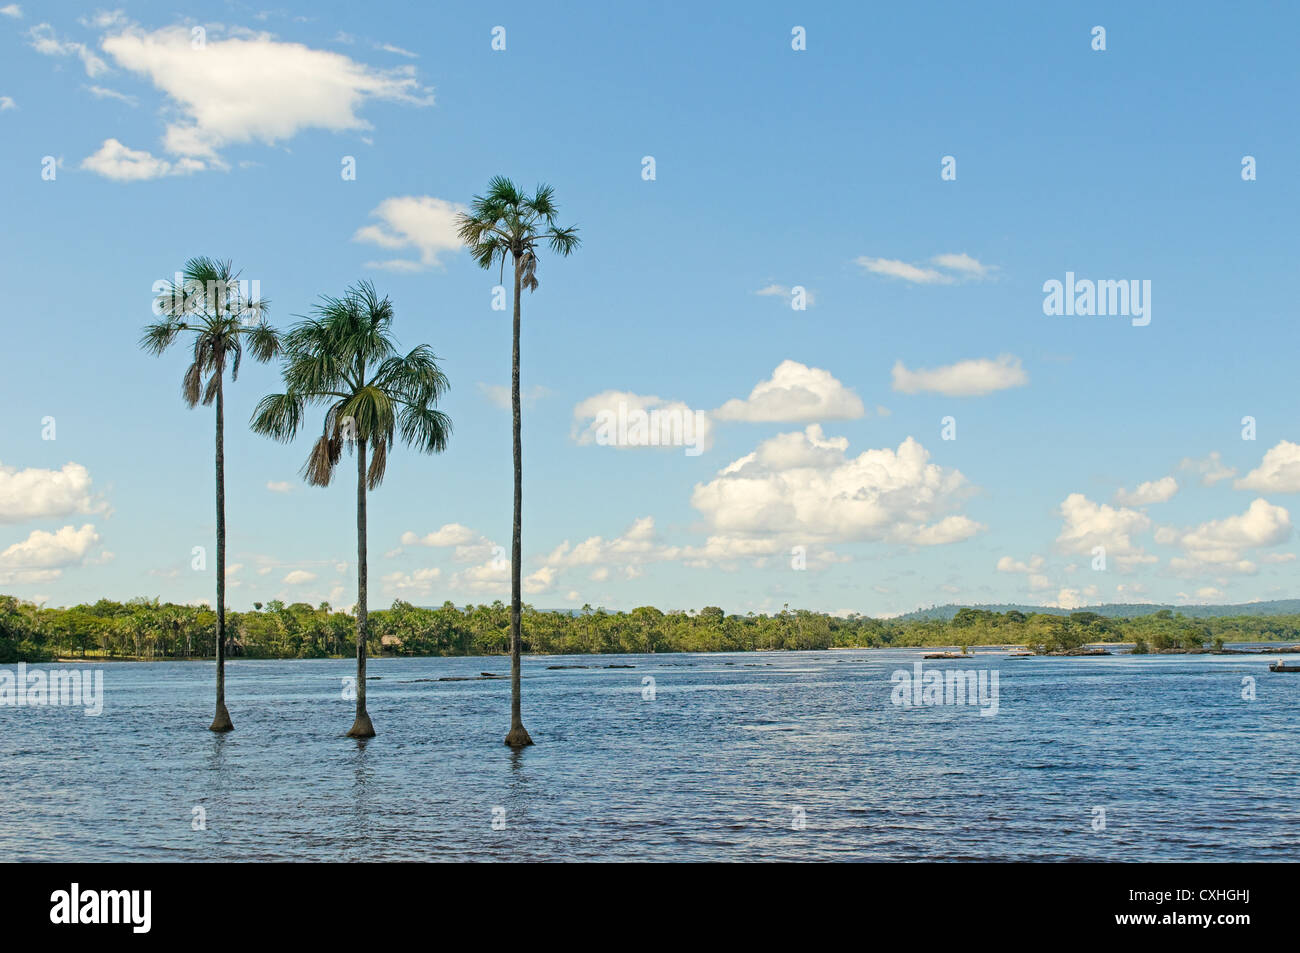 Canaima lagoon, Venezuela - Stock Image